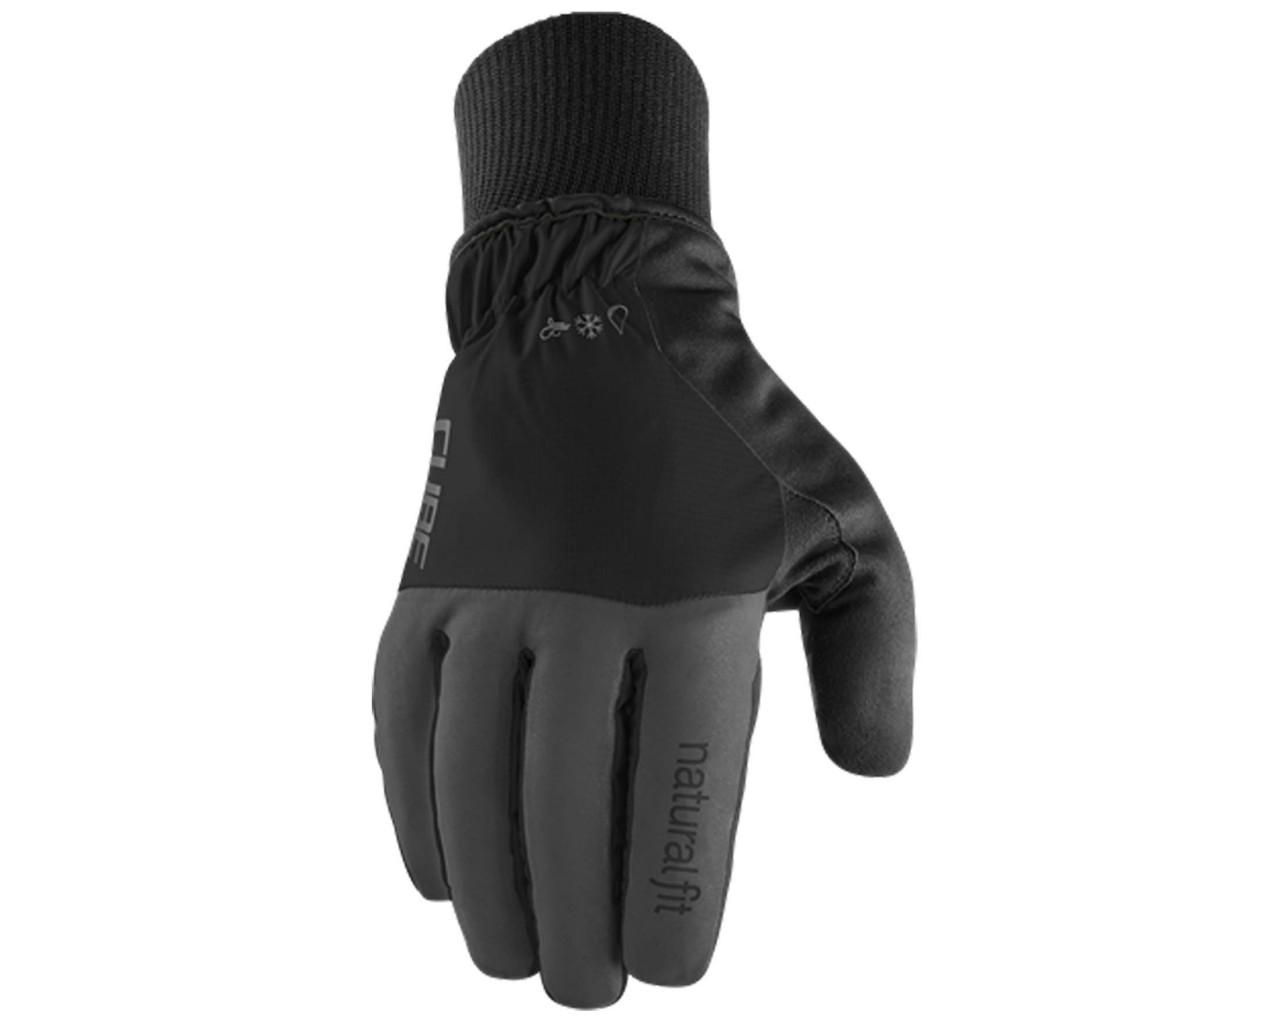 Cube Handschuhe Winter X NF langfinger | black